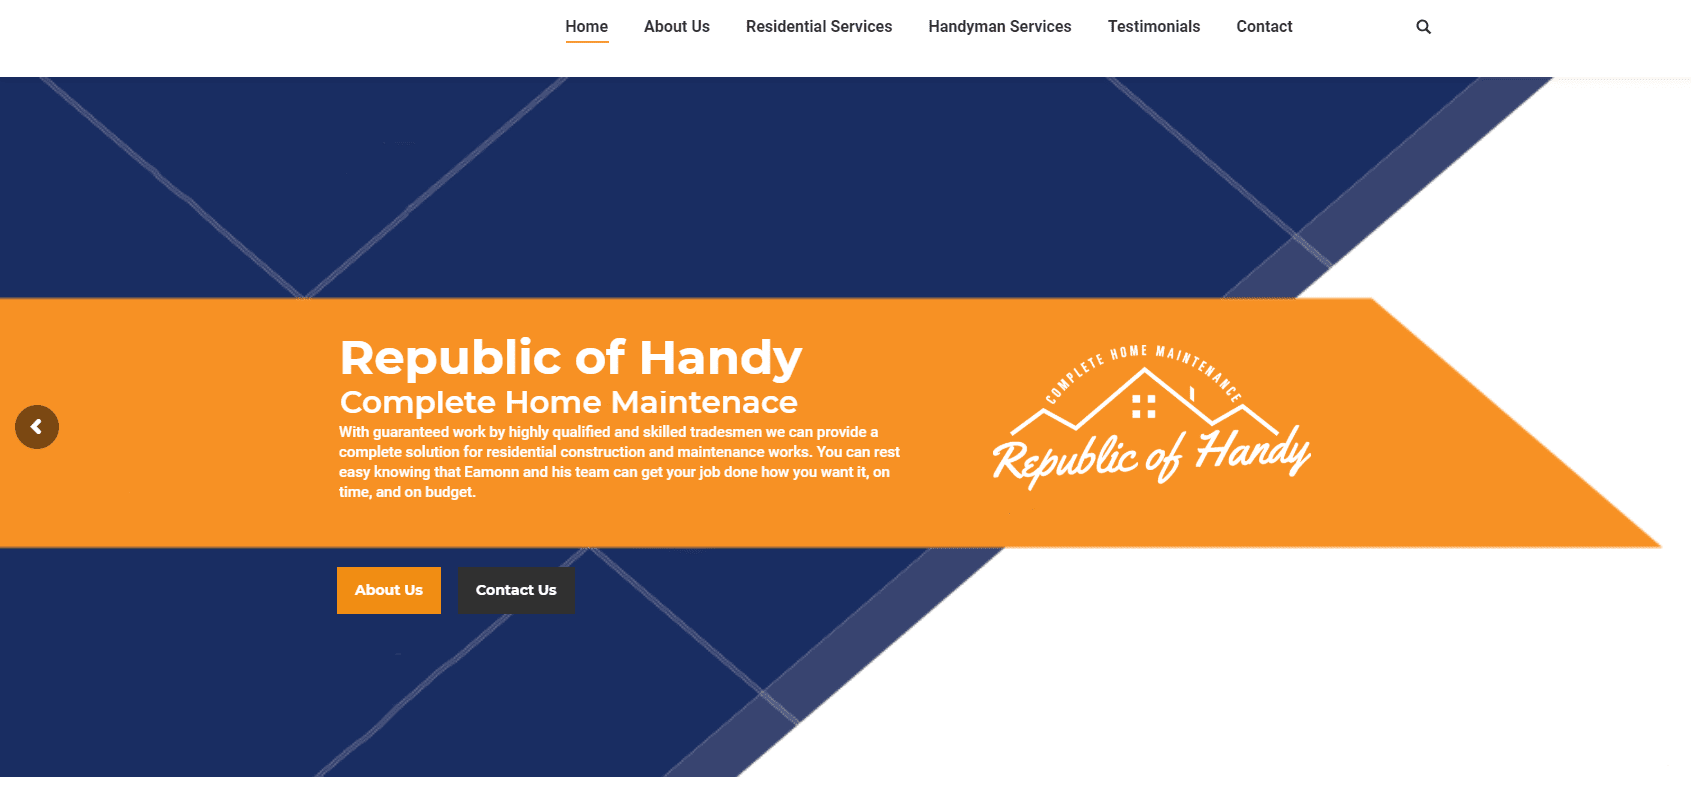 Republic of Handy